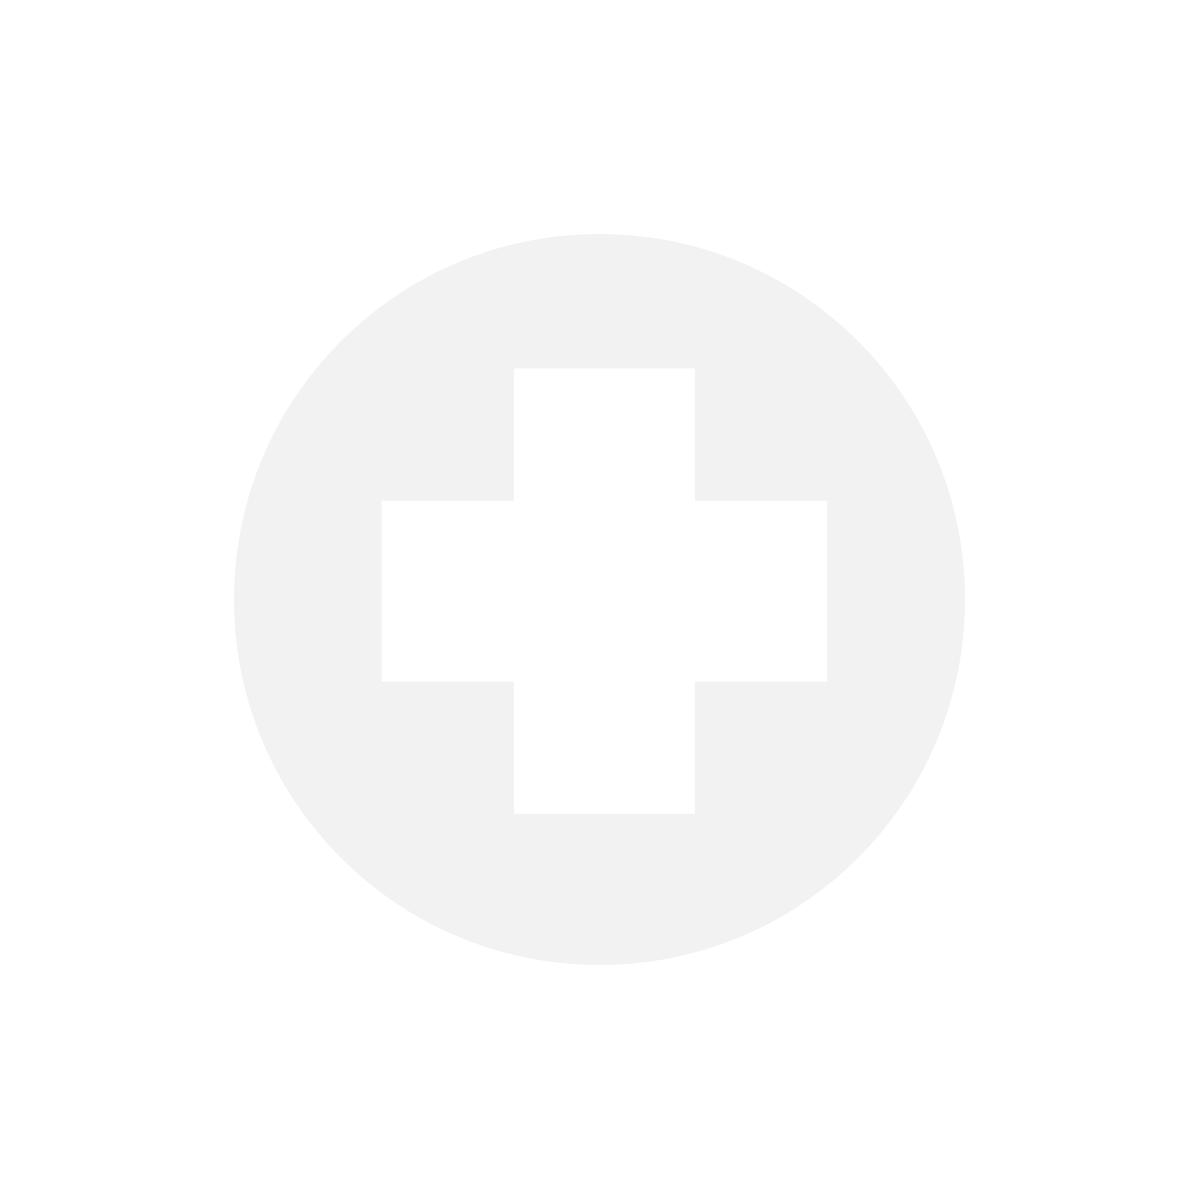 Draps d'examen Micro gaufrés - 135 formats